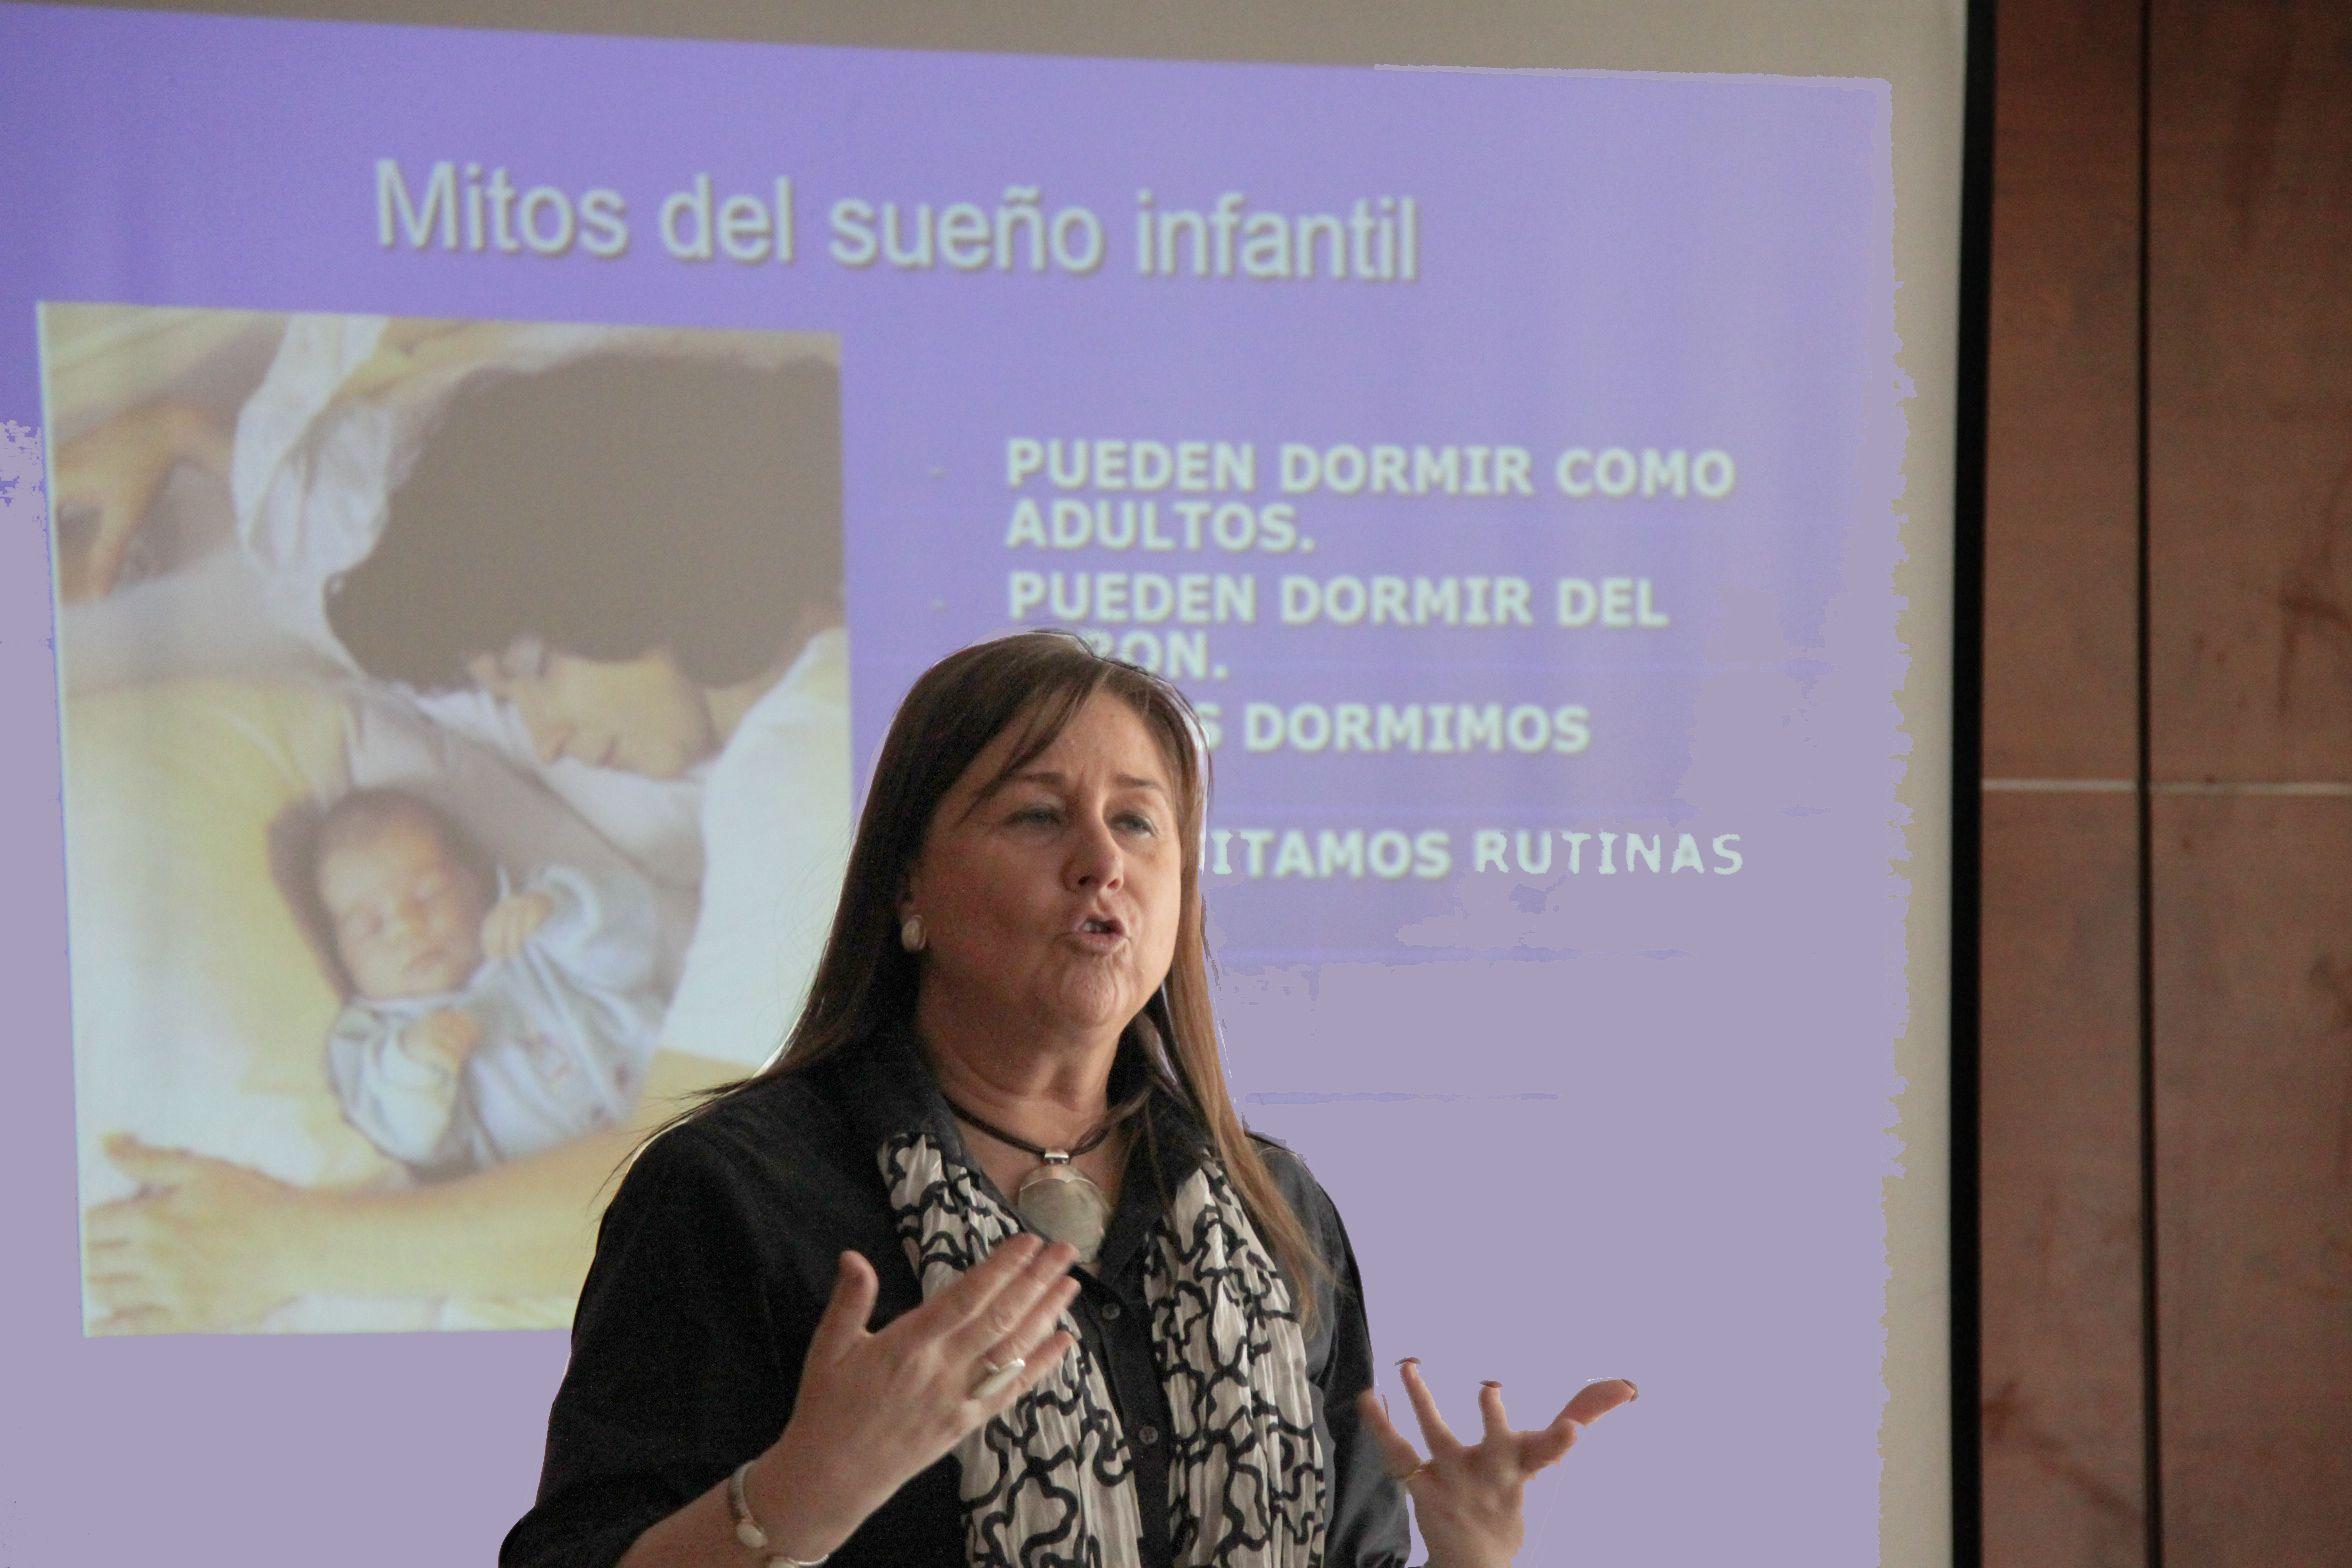 Mitos del sueño Infantil según Rosa Jové